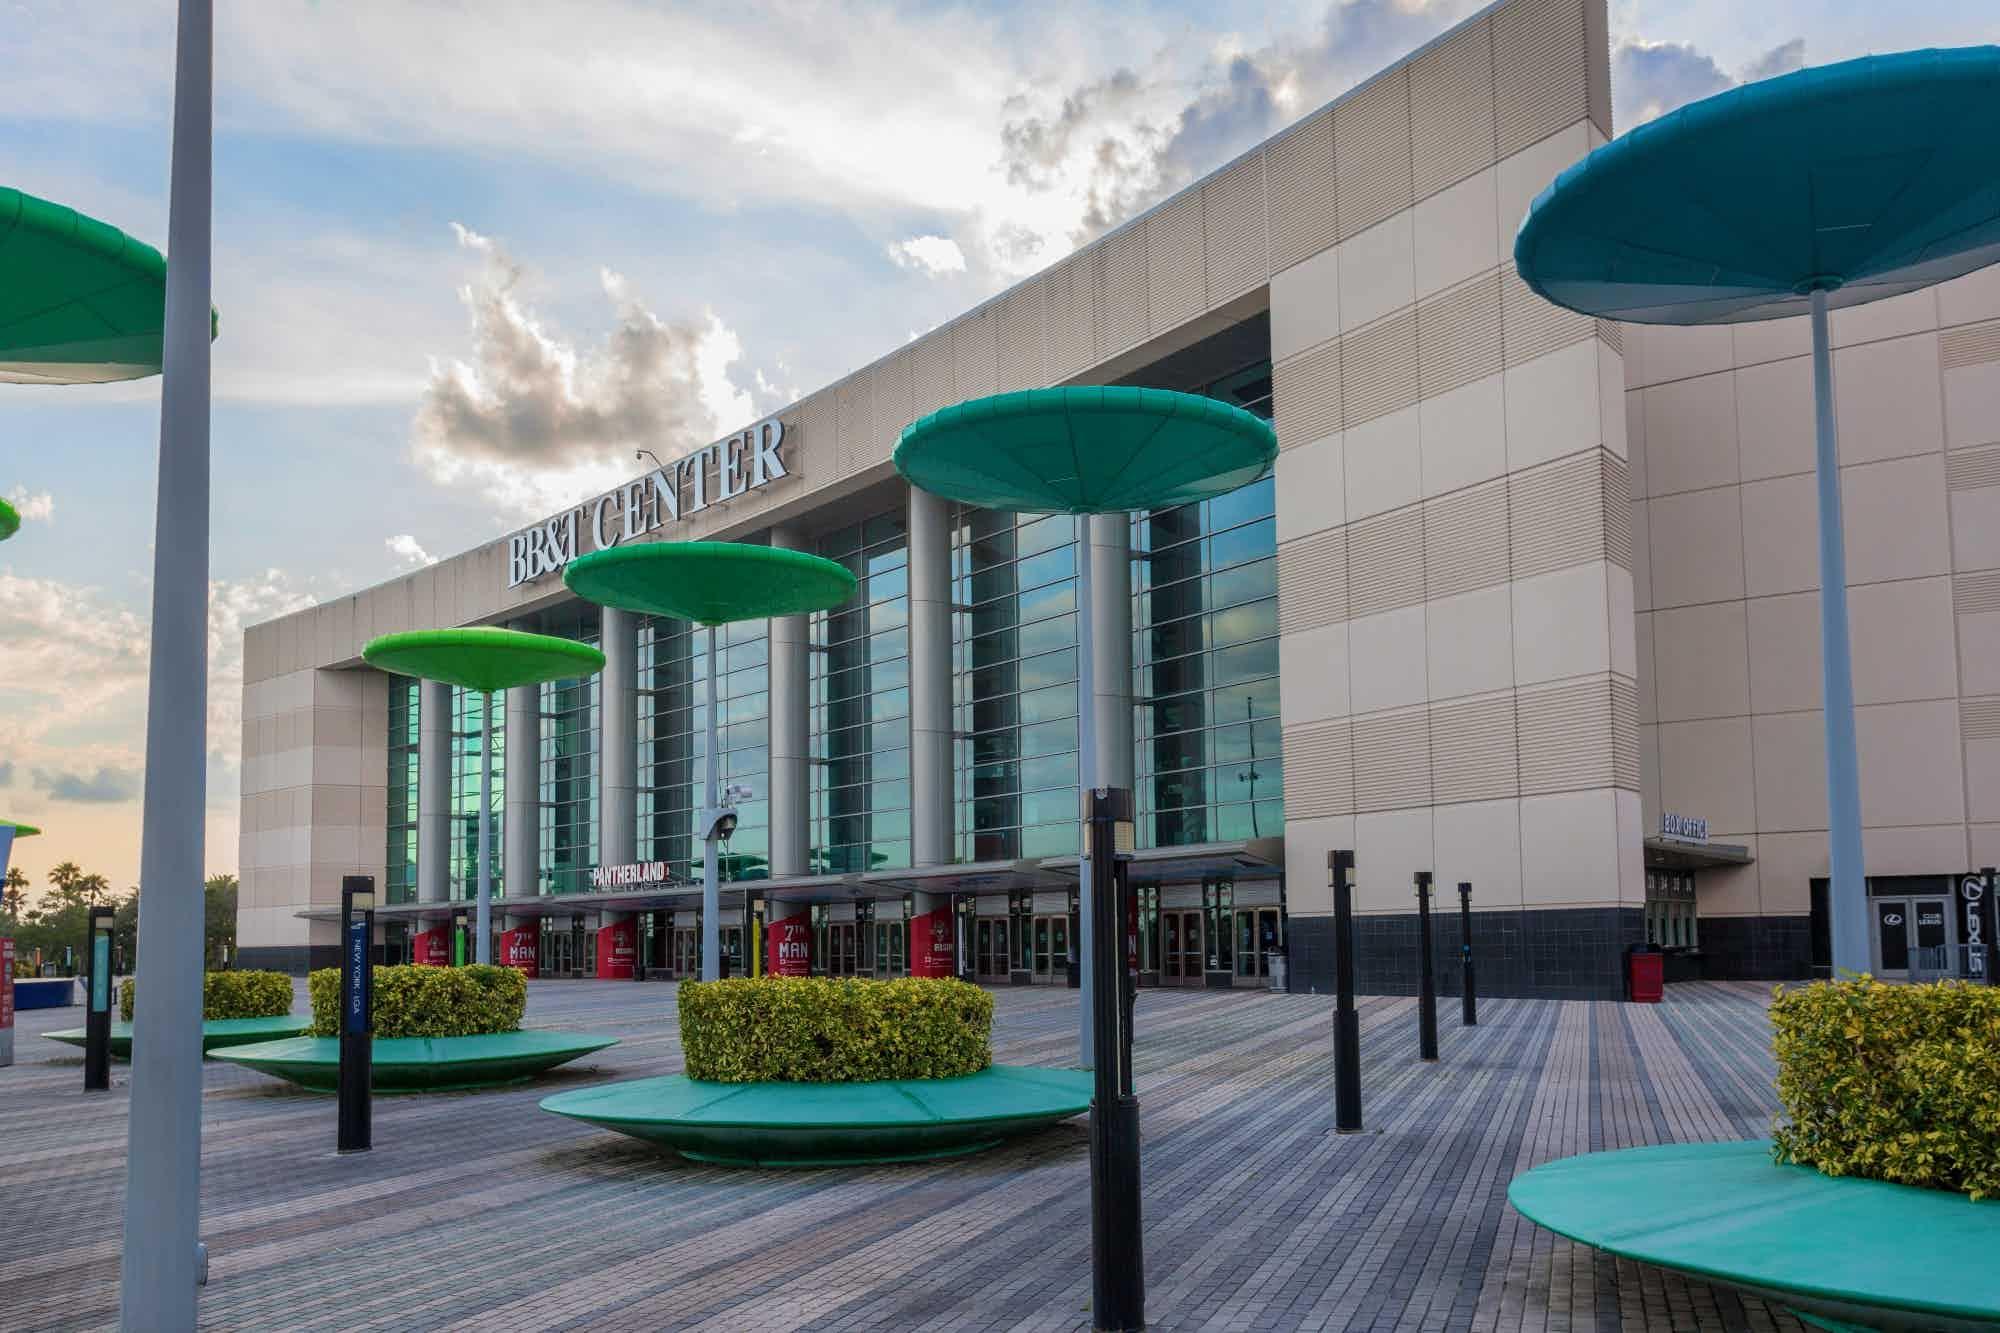 BB&T Center exterior